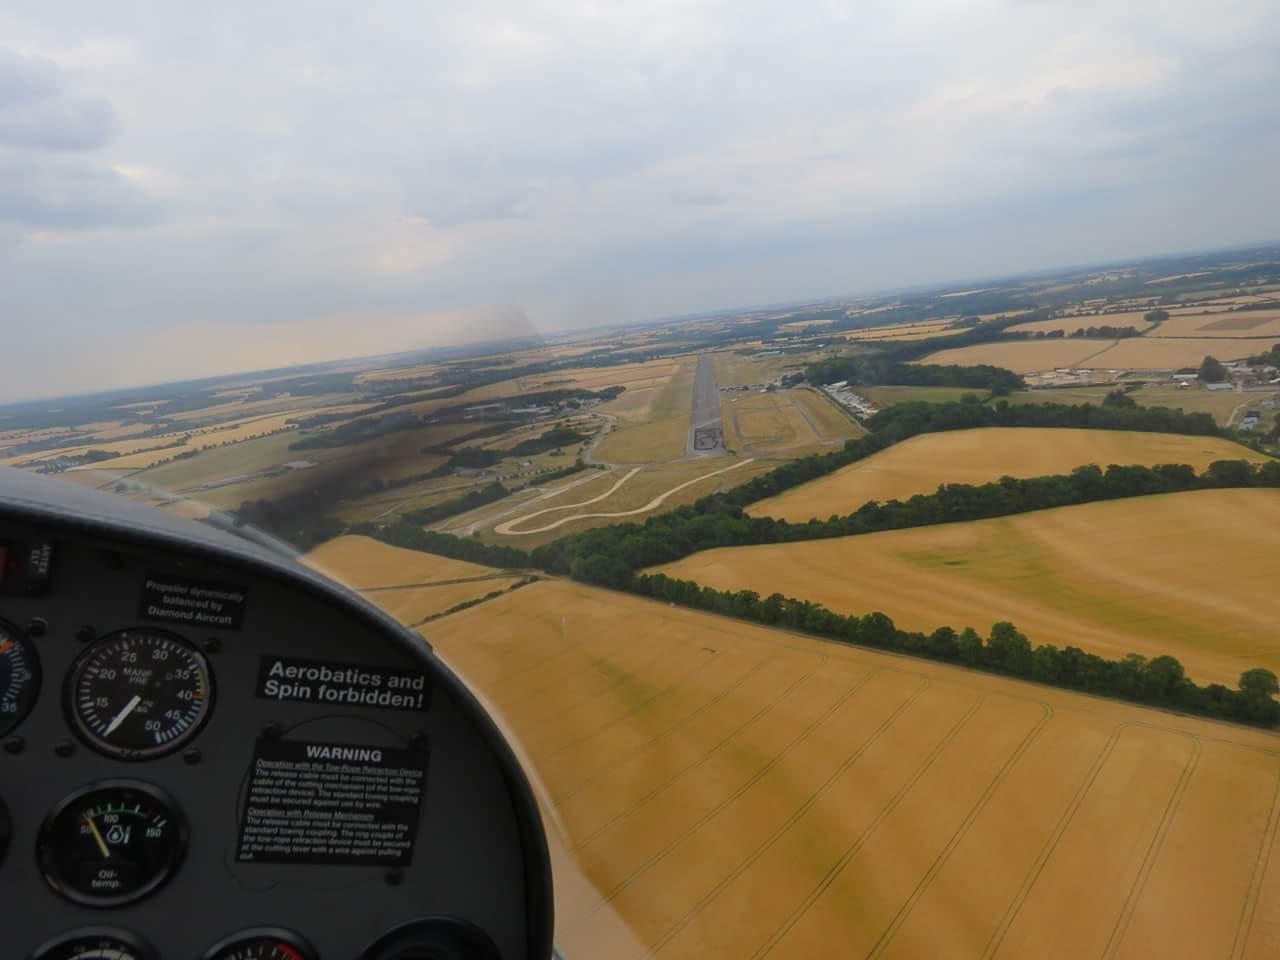 Dimona Motor Glider turning final at Enstone